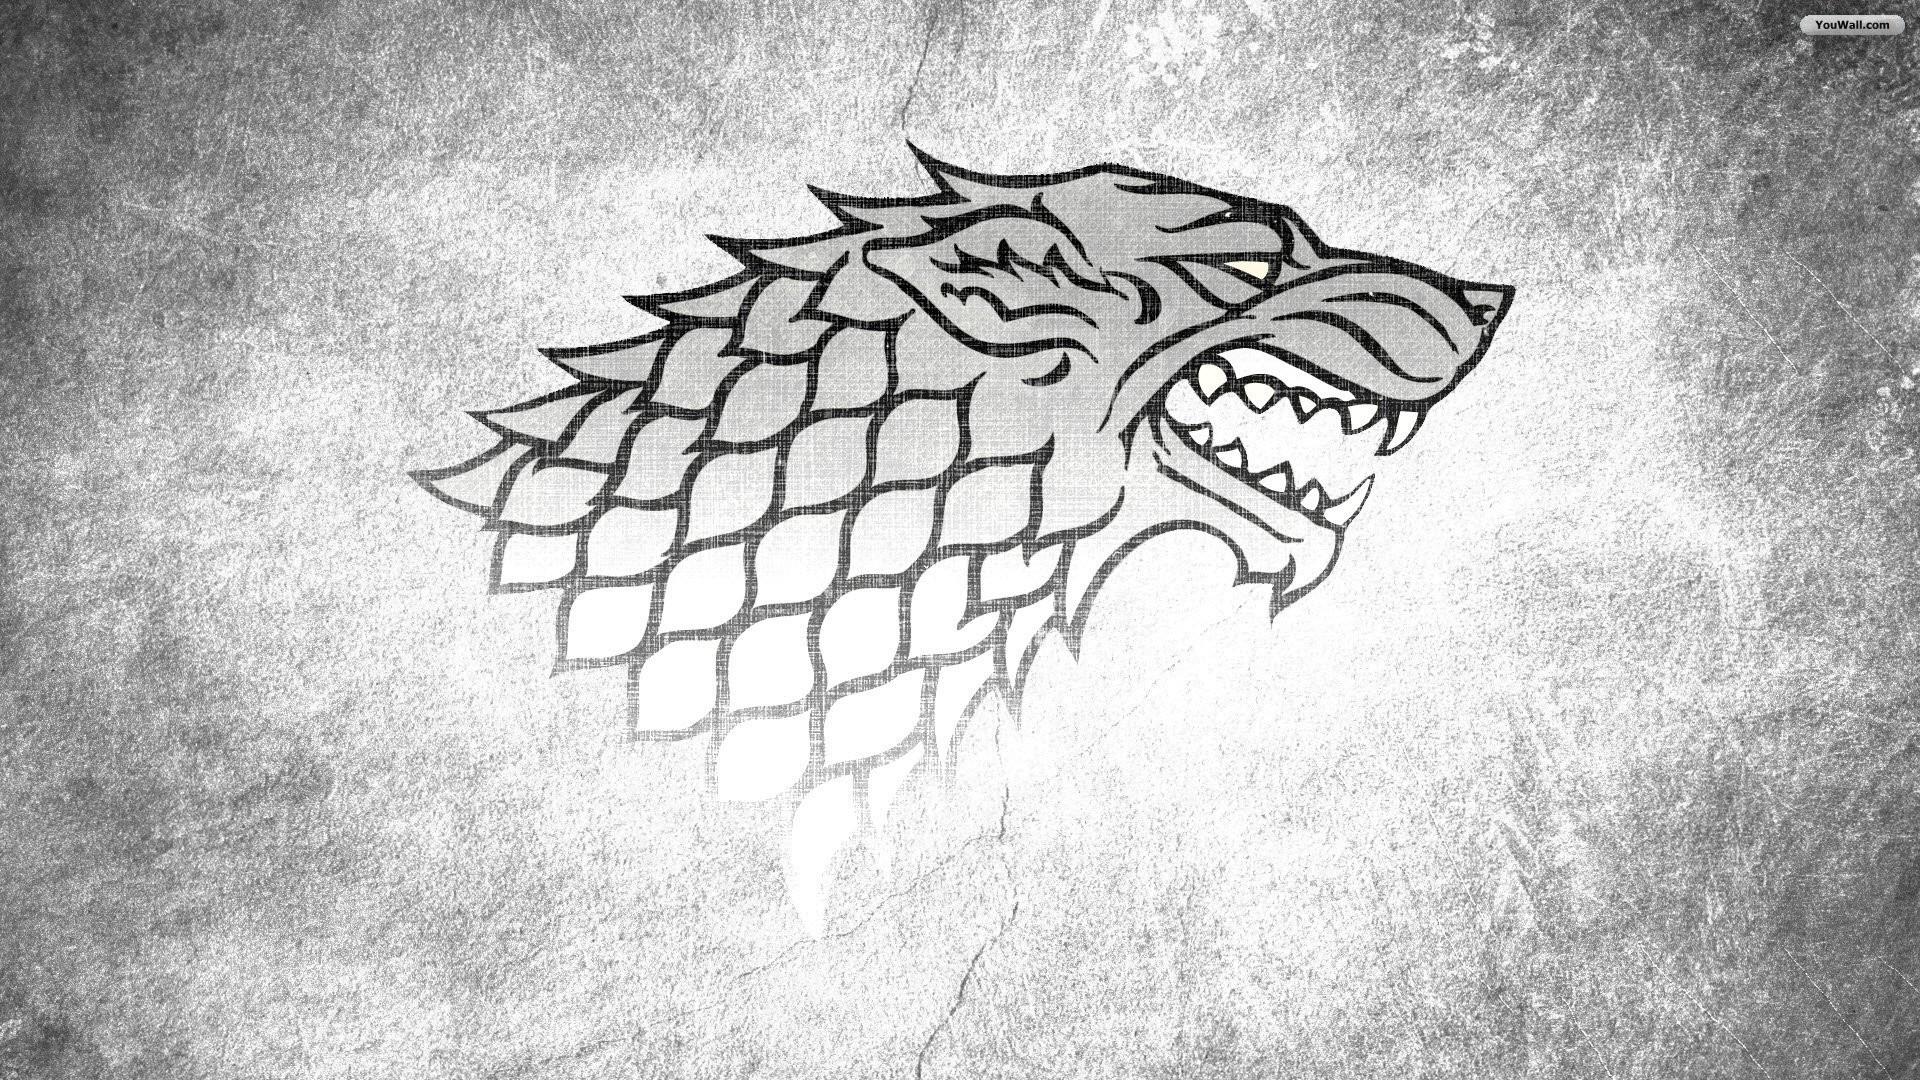 Game of Thrones – Stark Wallpaper